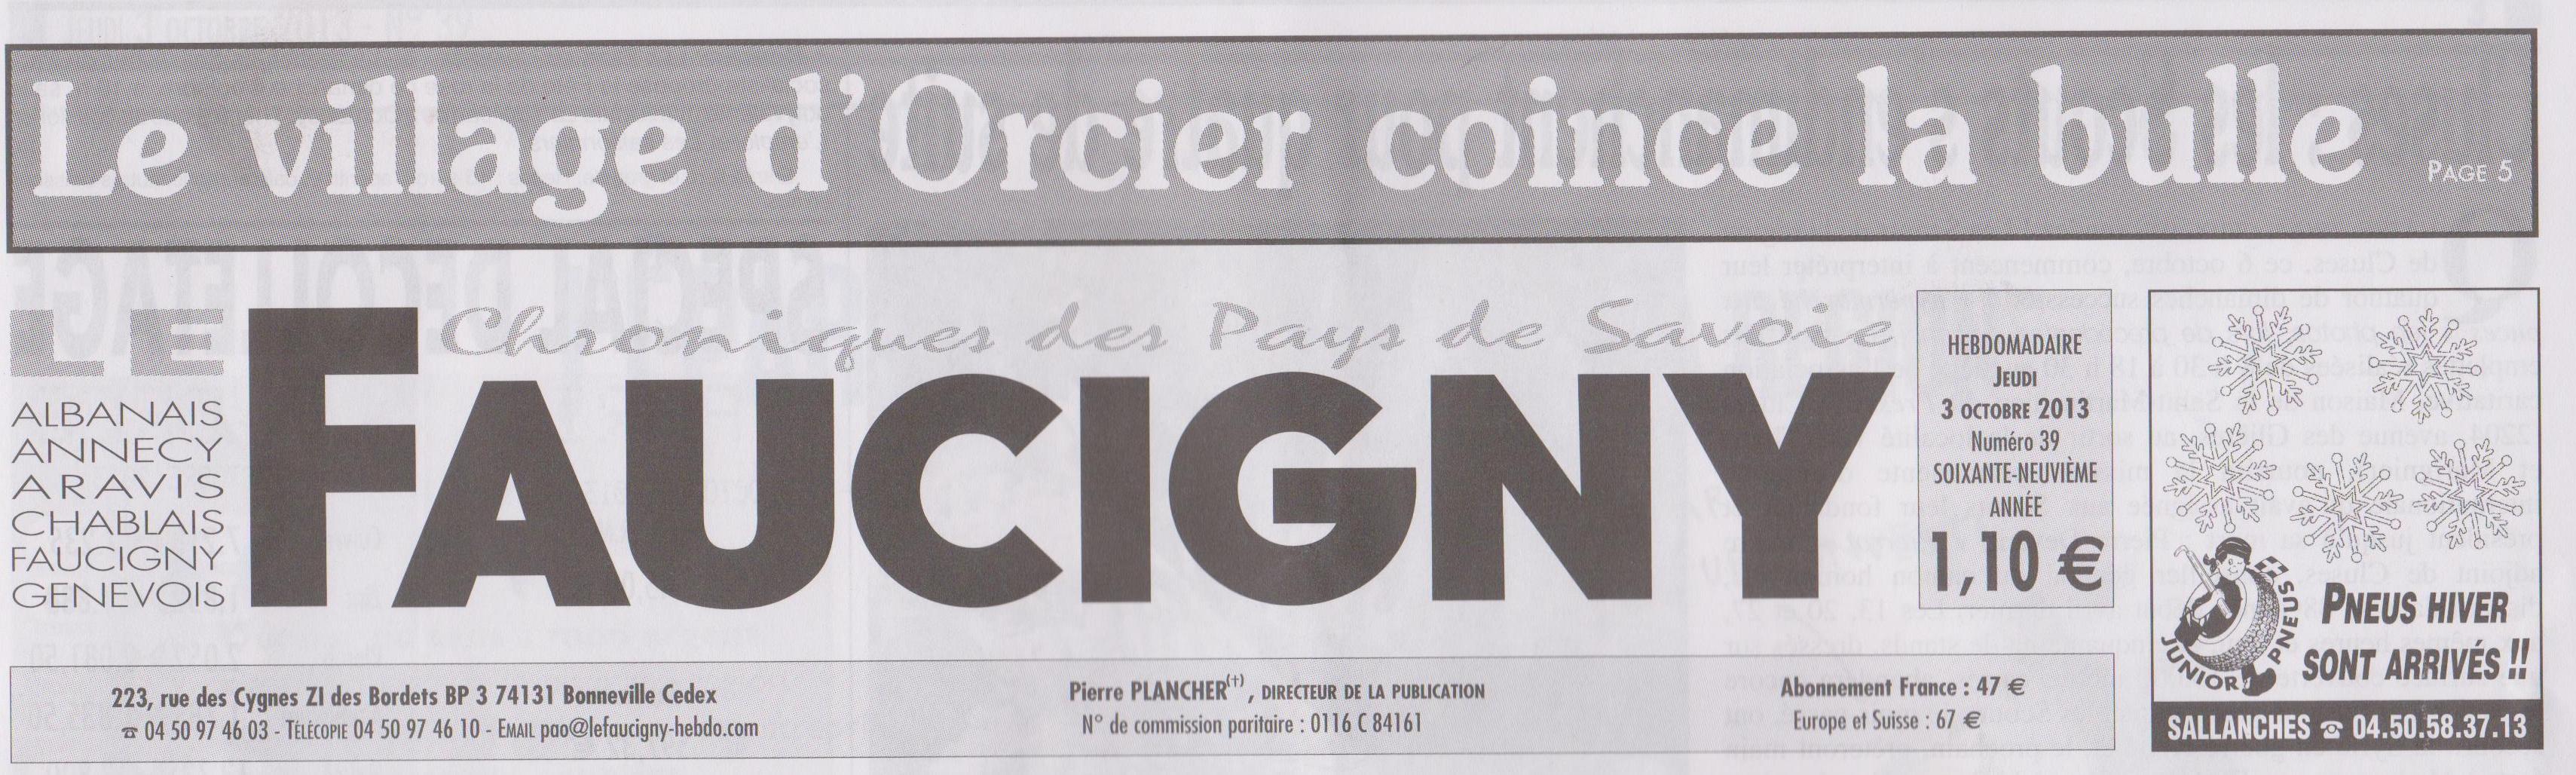 titre Faucigny - 03-10-13